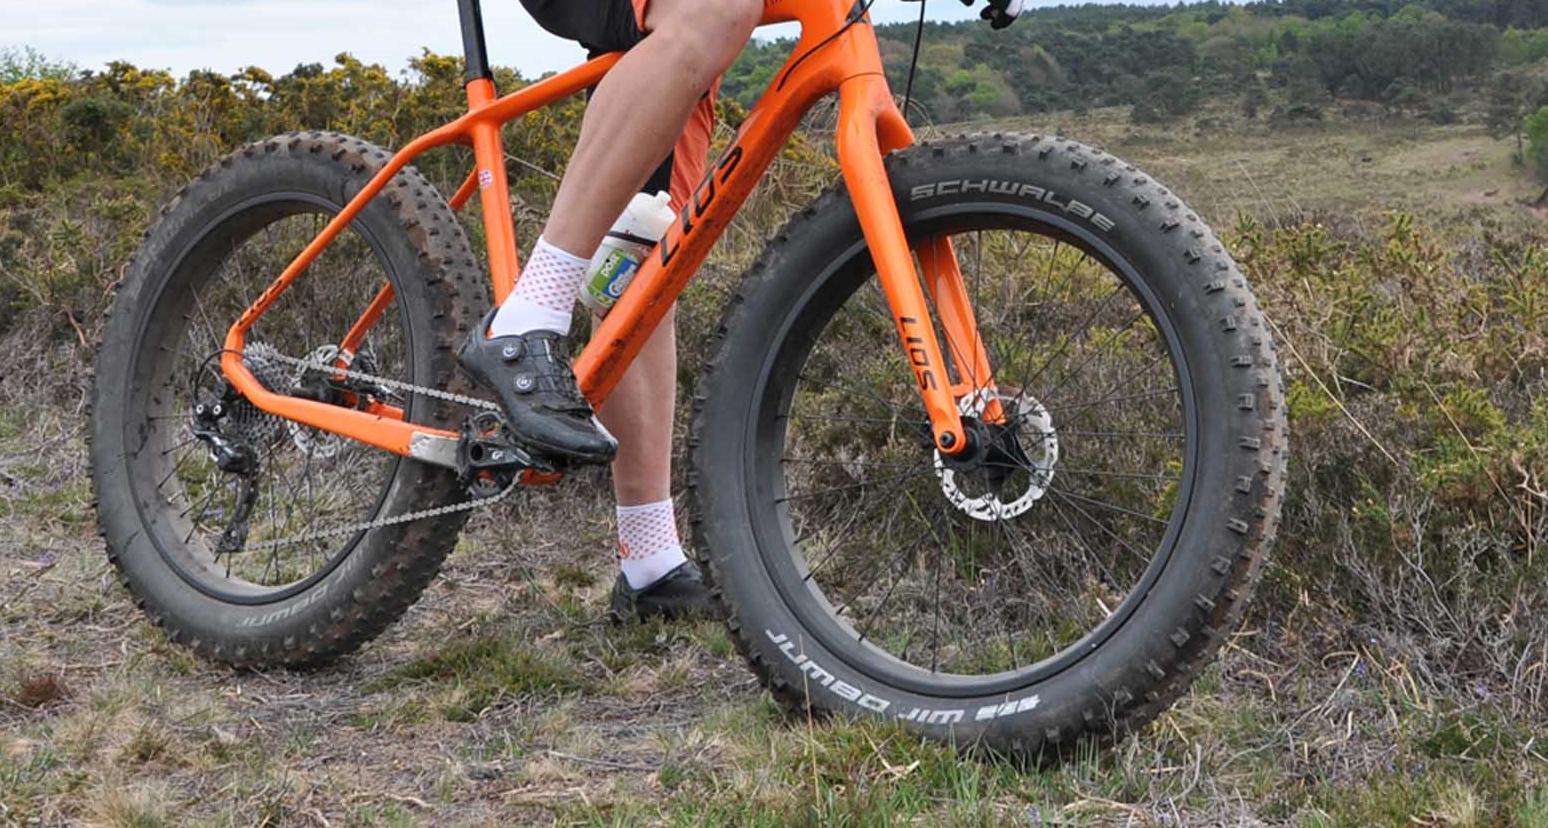 LIOS Bomber Fatbike Wheel